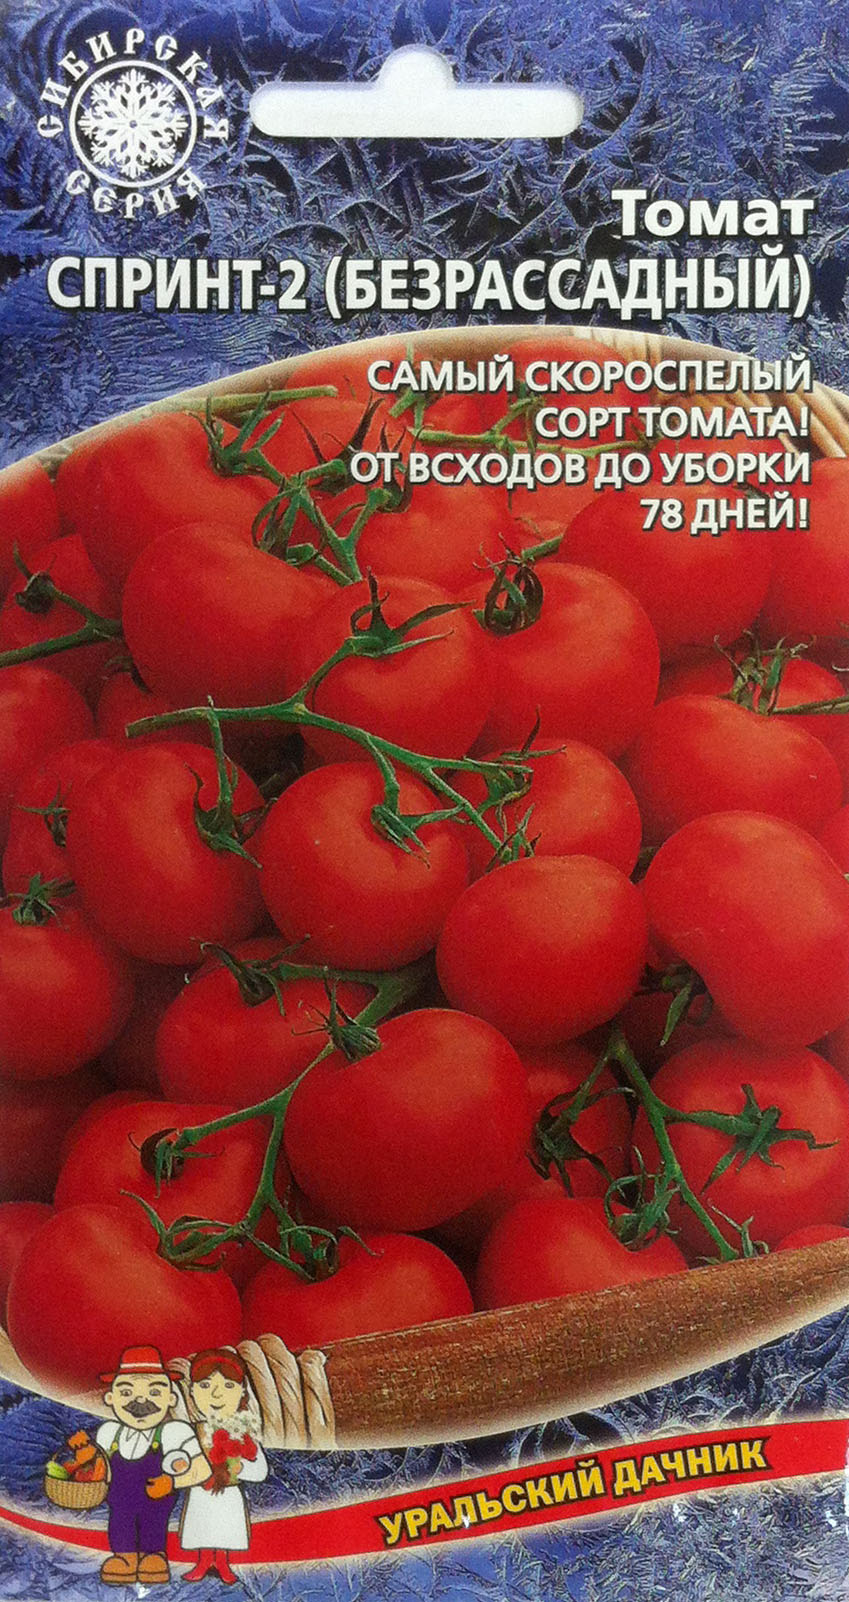 Томат Бони мм: описание сорта, отзывы, фото, характеристика 8